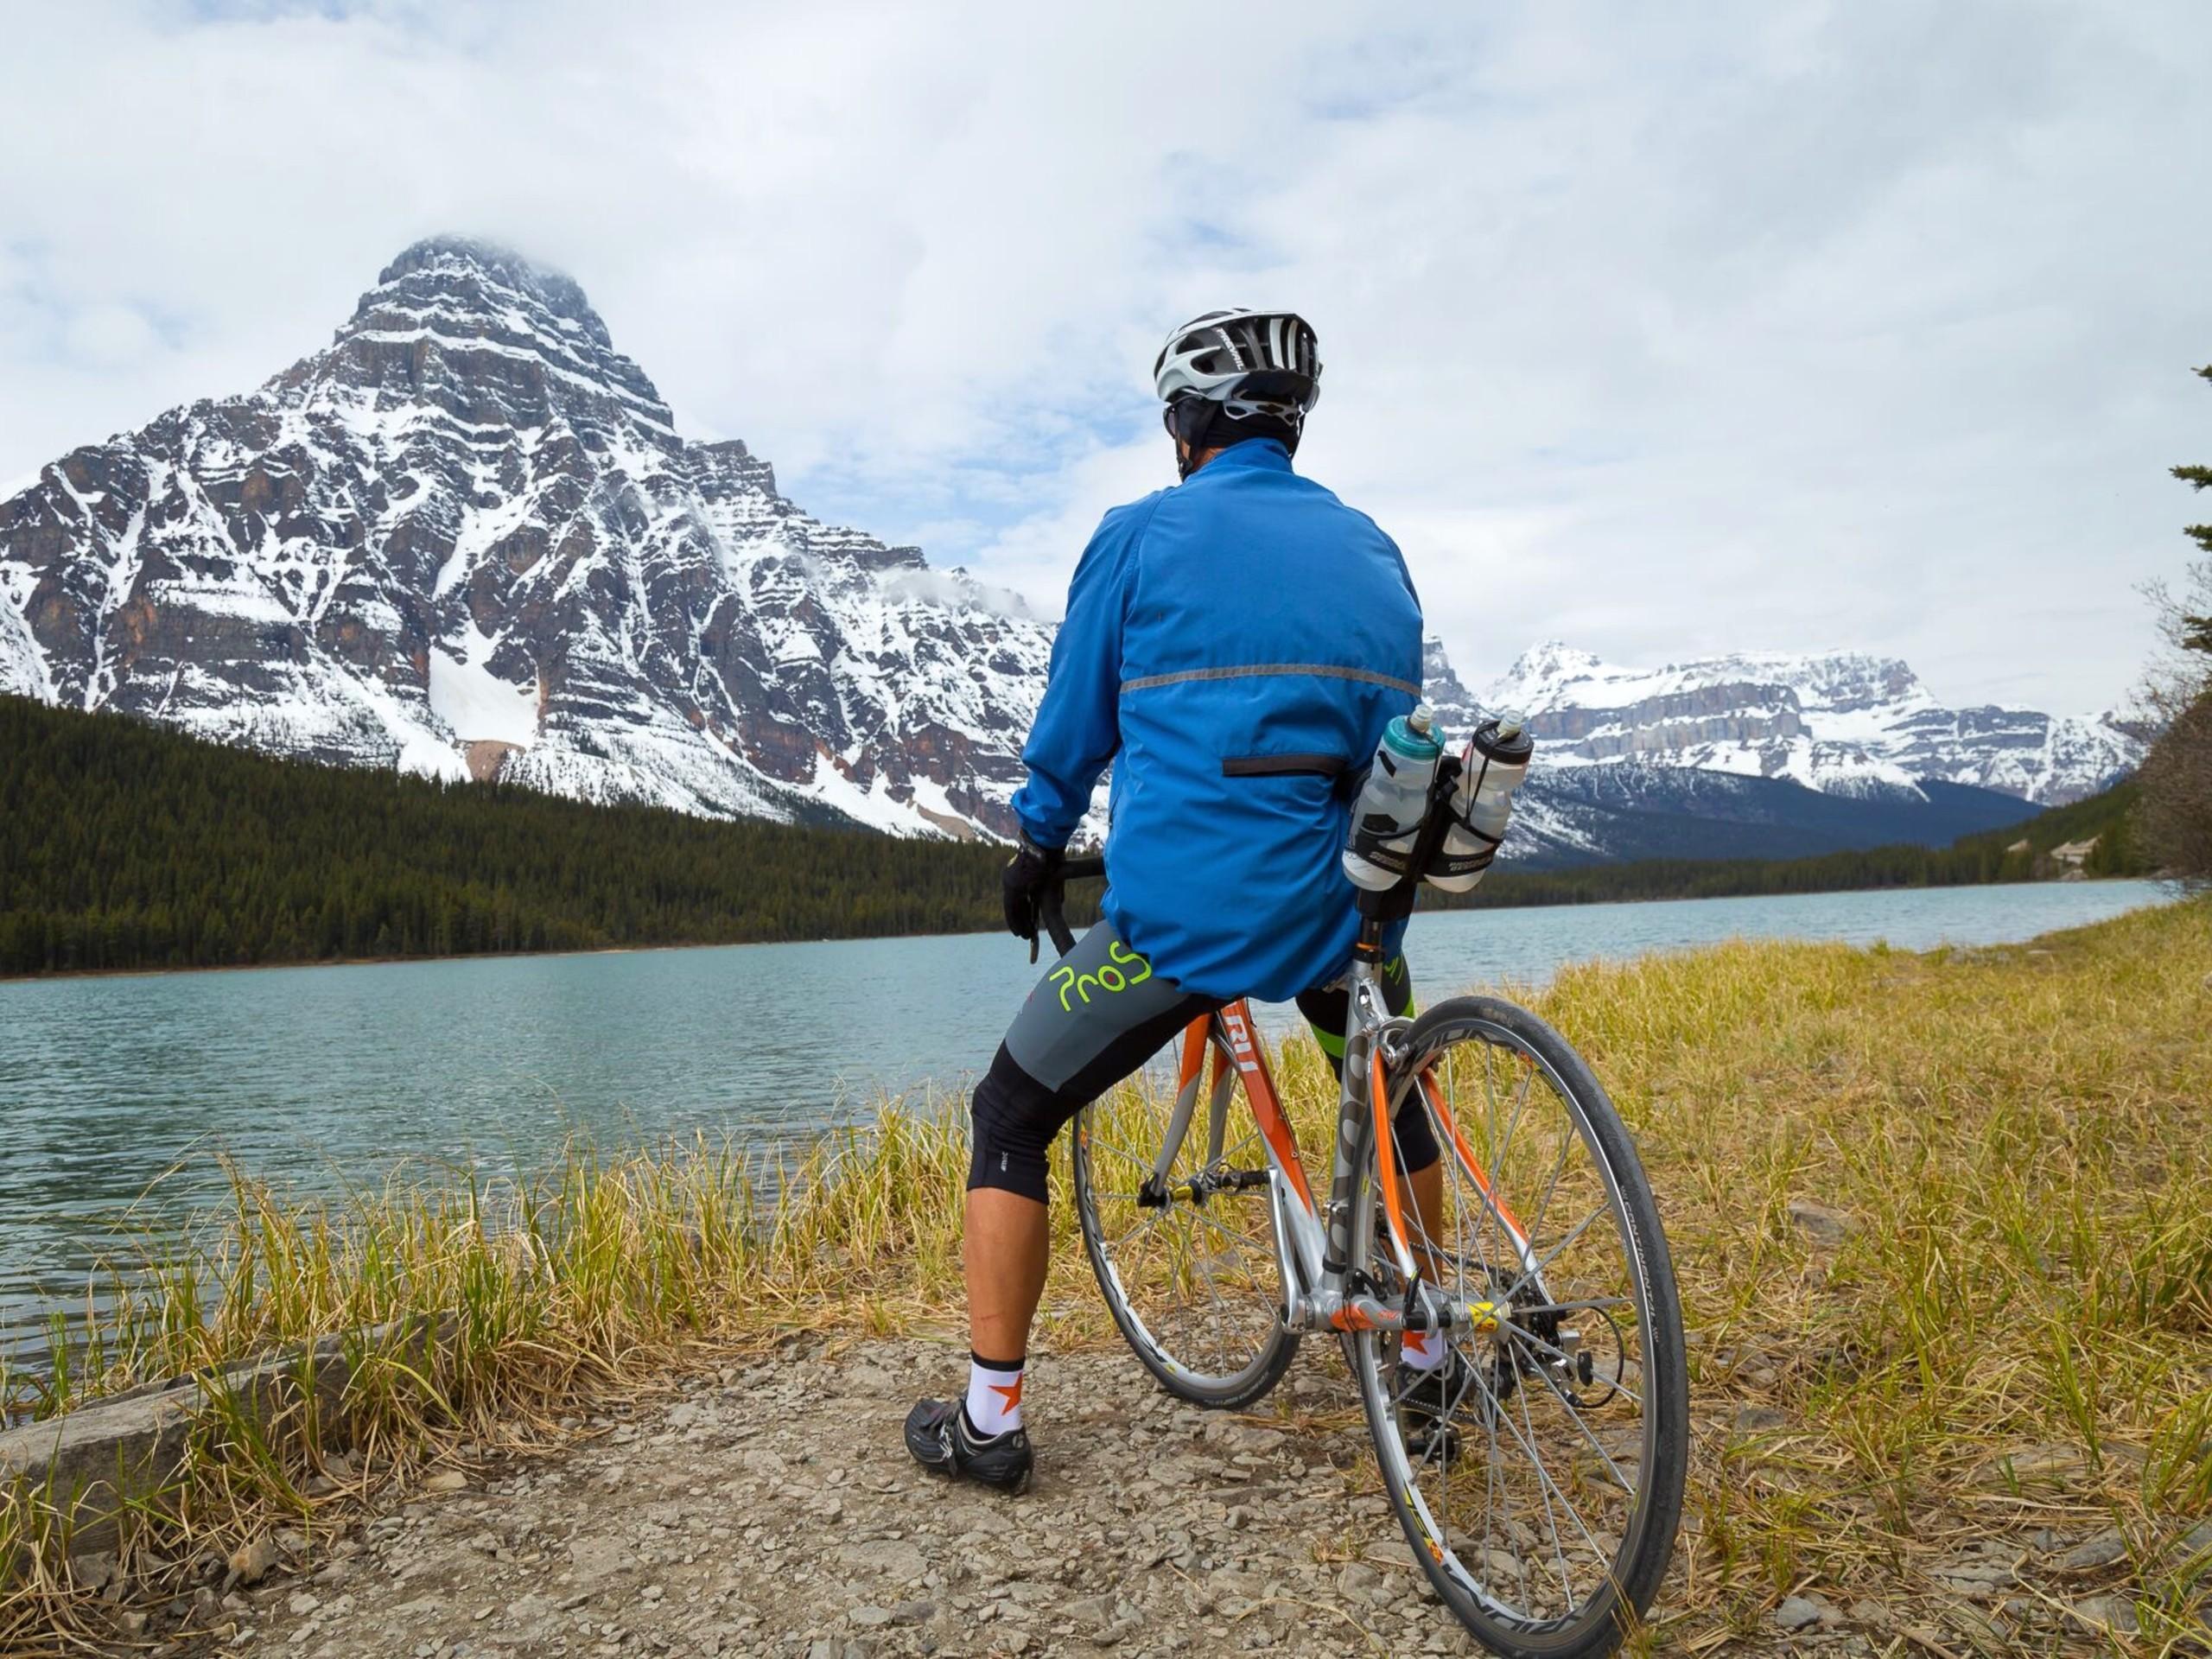 Biker observing the beautiful views near the river in Alberta